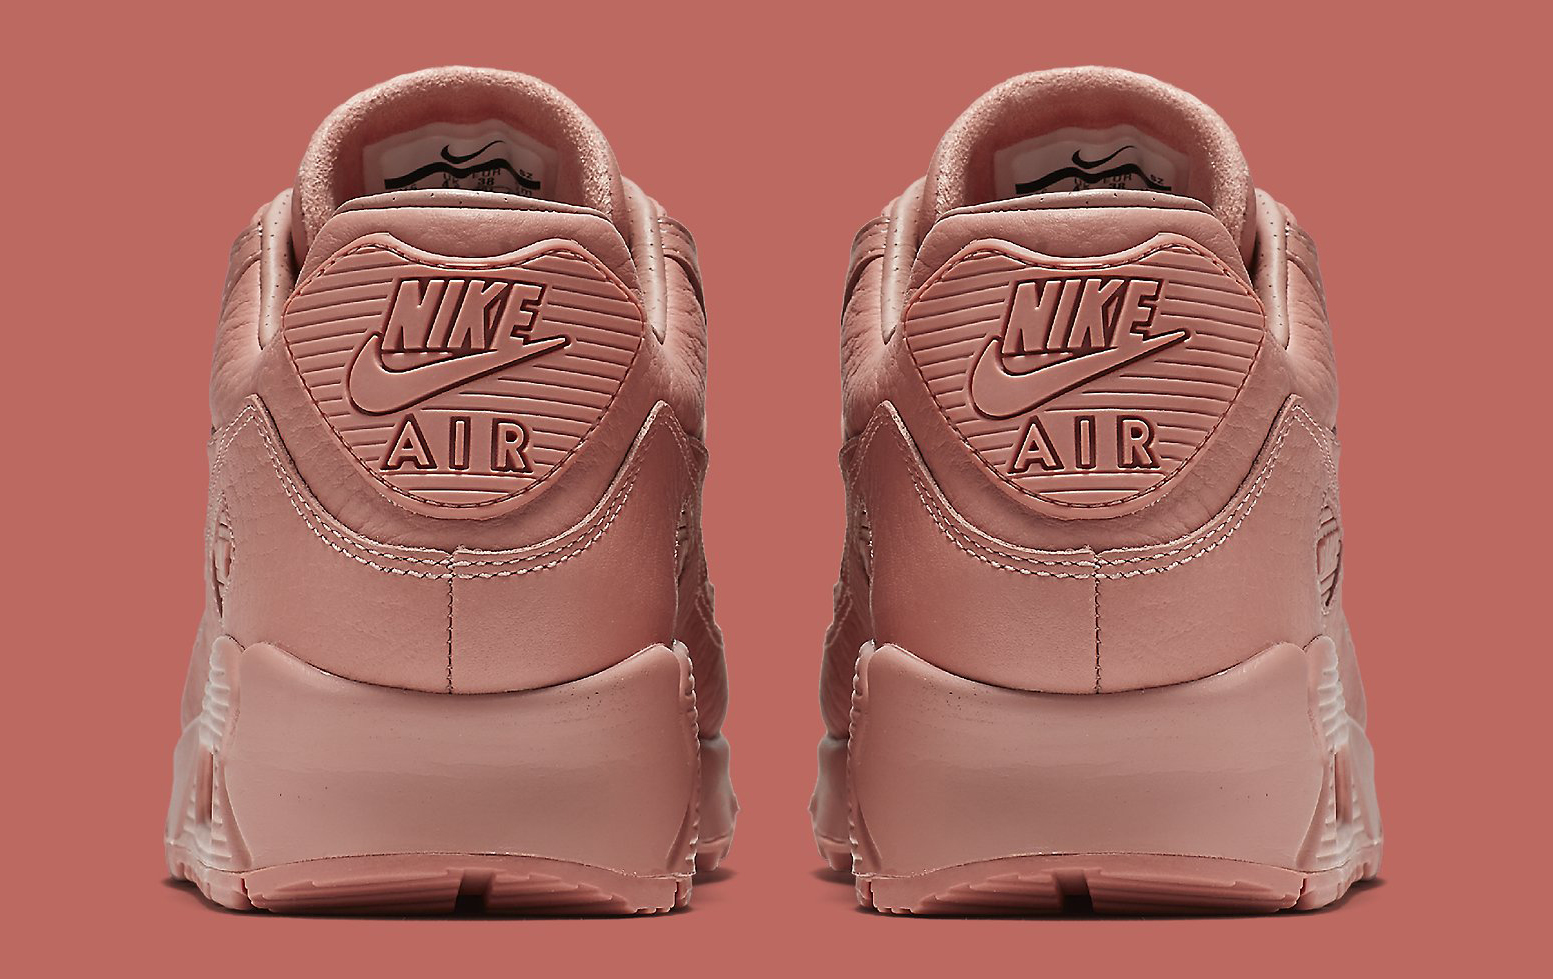 99e130c17013 ... Max 90 Pinnacle Pink 839612-601 Heel Image via Nike ...